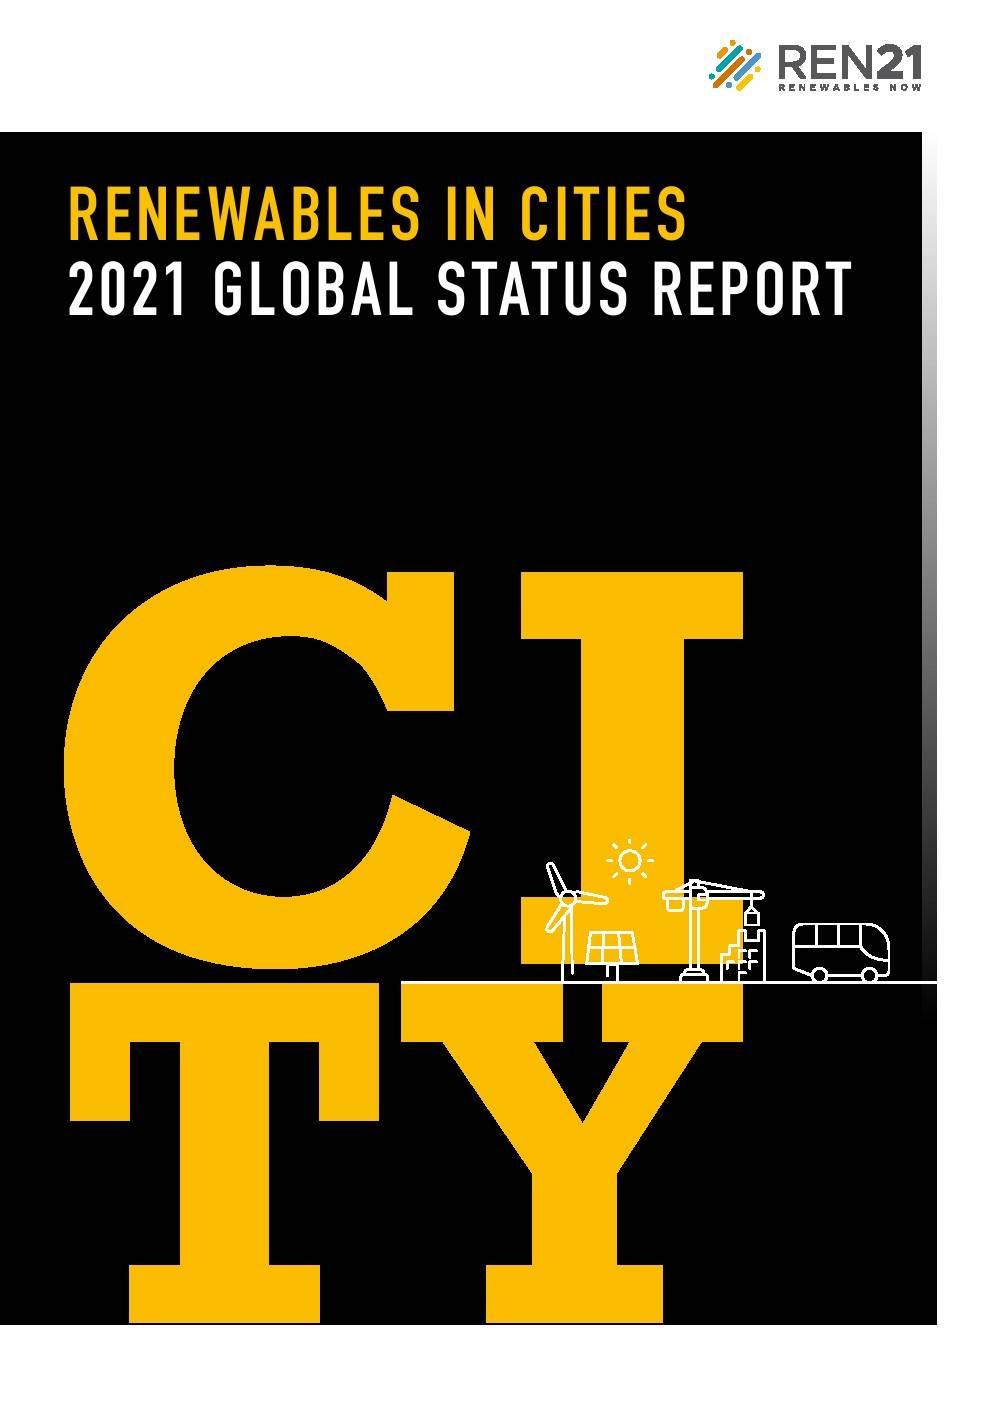 REN21:2021年全球城市可再生能源报告